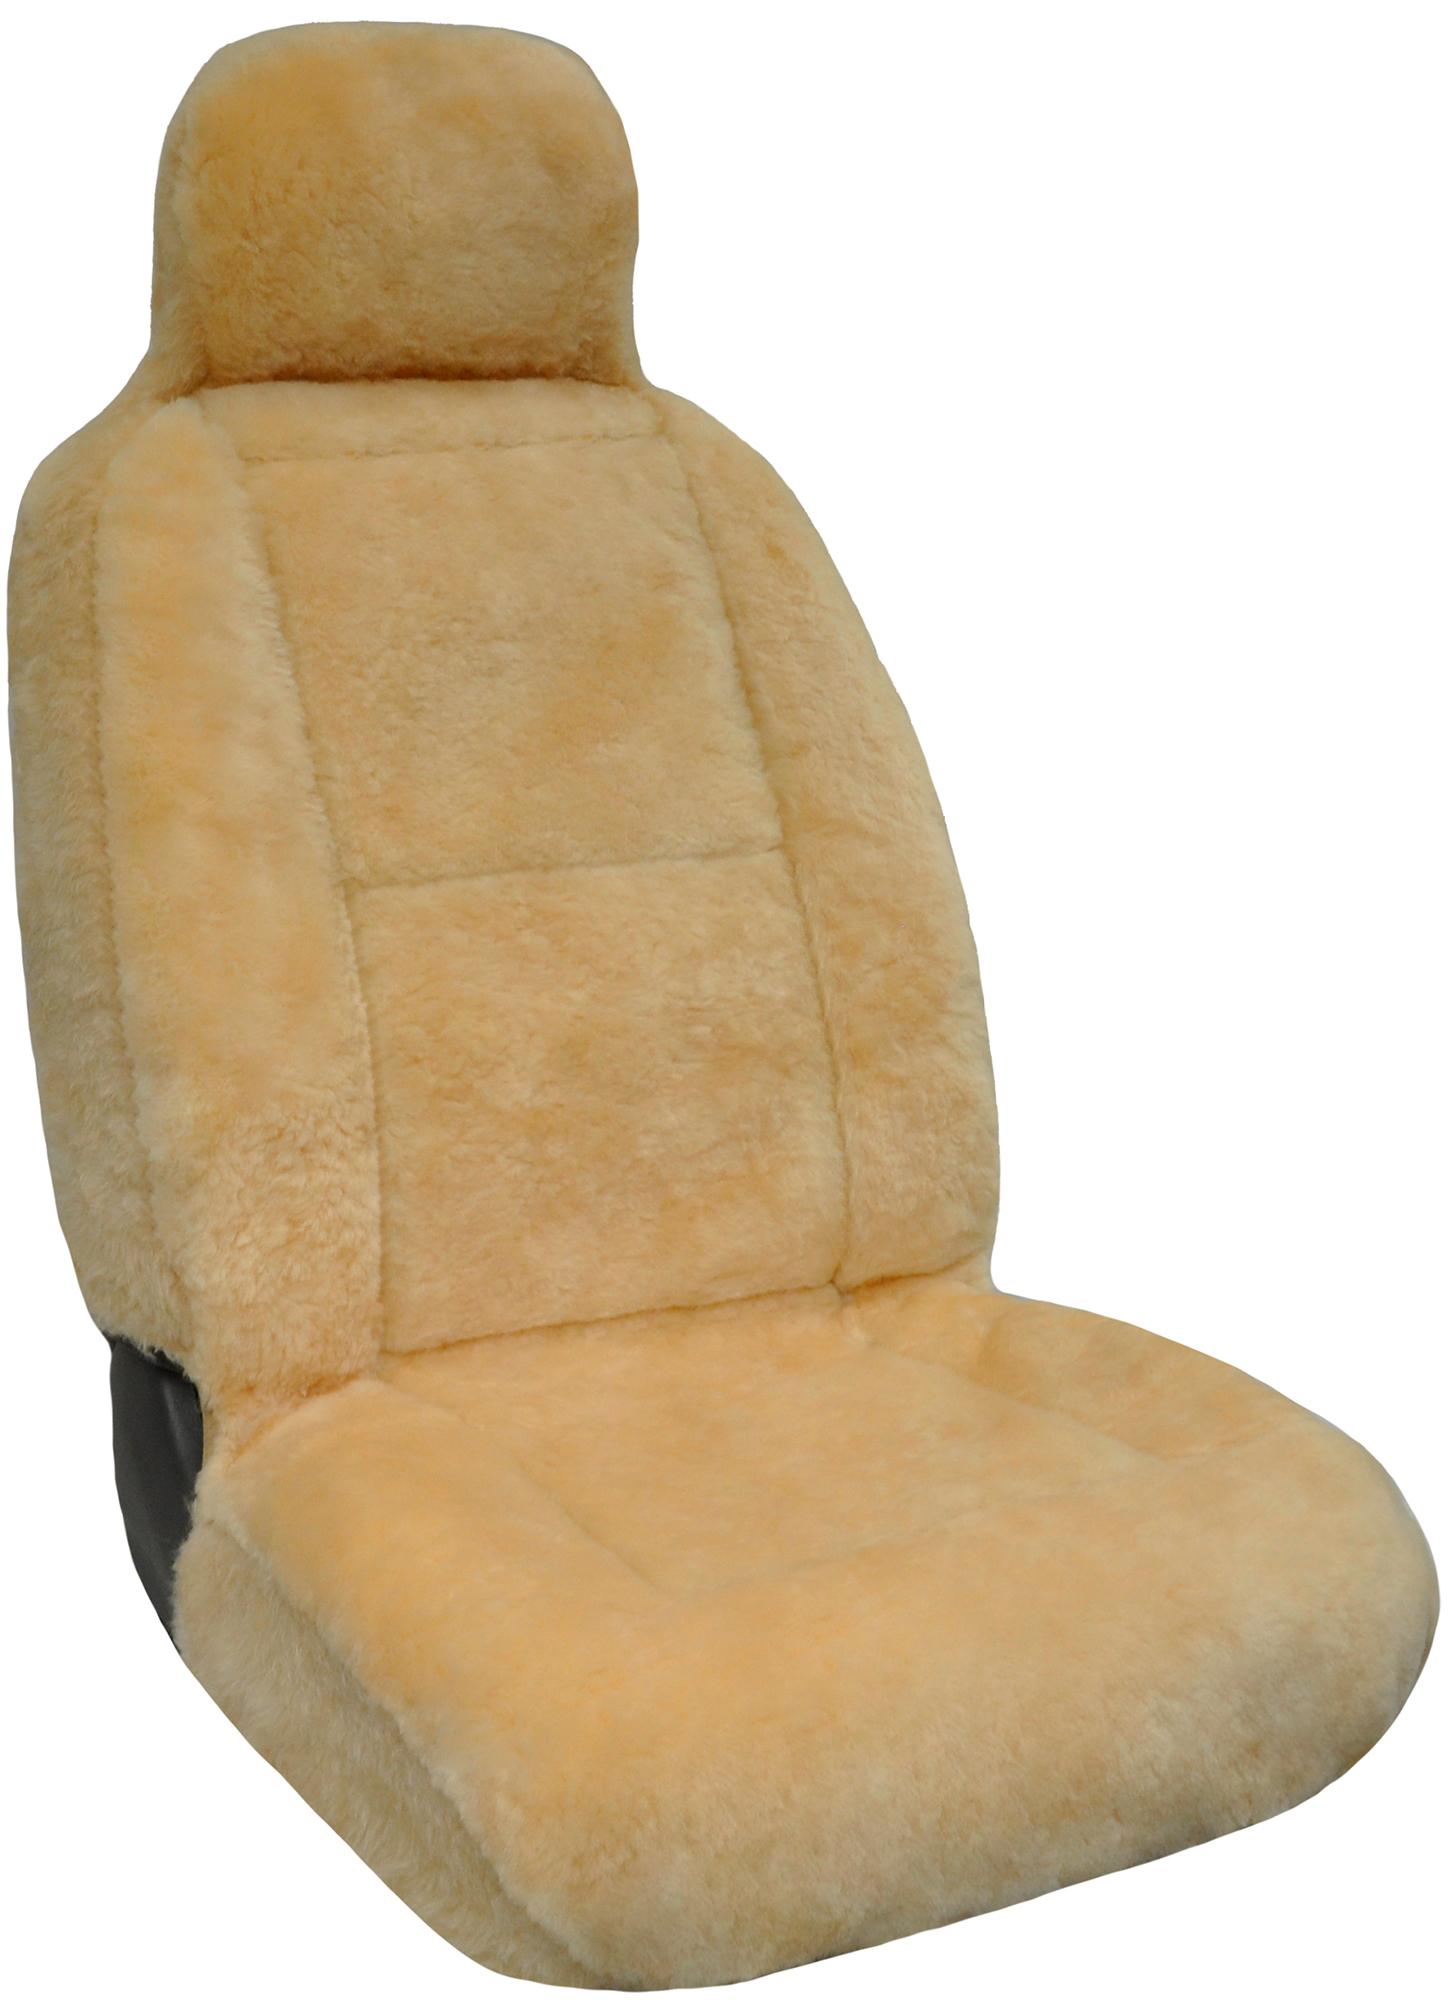 Eurow sheepskin seat cover new xl design premium pelt for Motor sheep seat covers